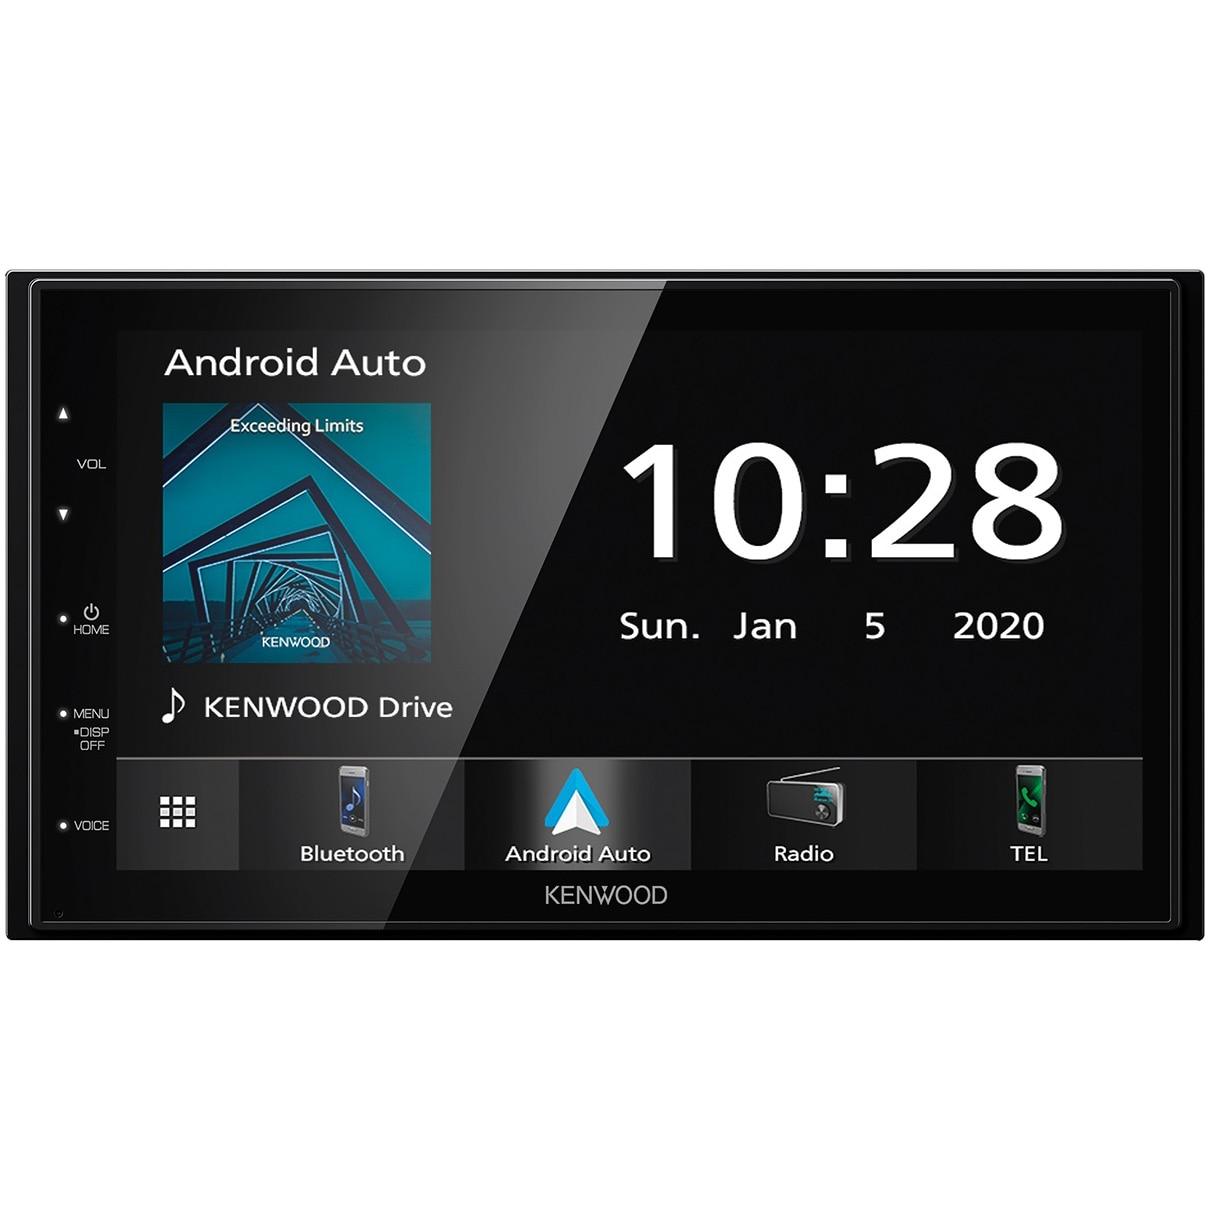 "Fotografie Sistem multimedia Kenwood DMX5020BTS 2 DIN fara CD, Apple CarPlay & Android Auto Mirroring pentru Android, Ecran tactil capacitiv de 6.8"", USB 1.5A, Bluetooth® incorporat, Conectare rapida smartphone"